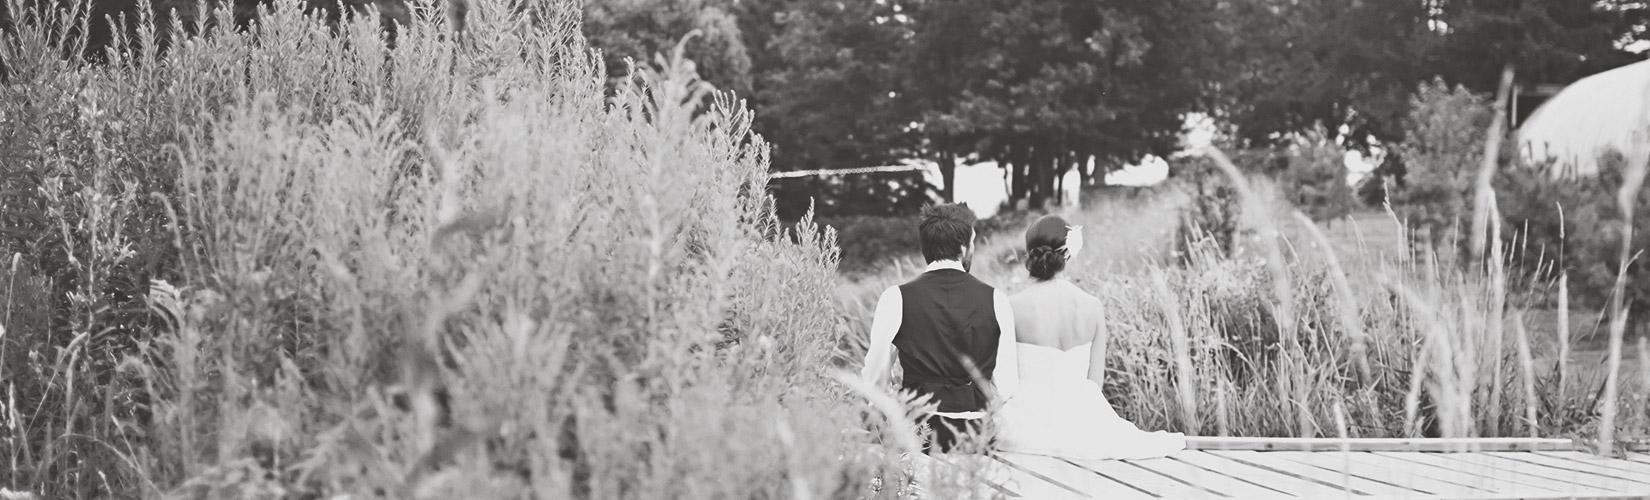 pareja-puente-de-madera-disena-tu-boda-web